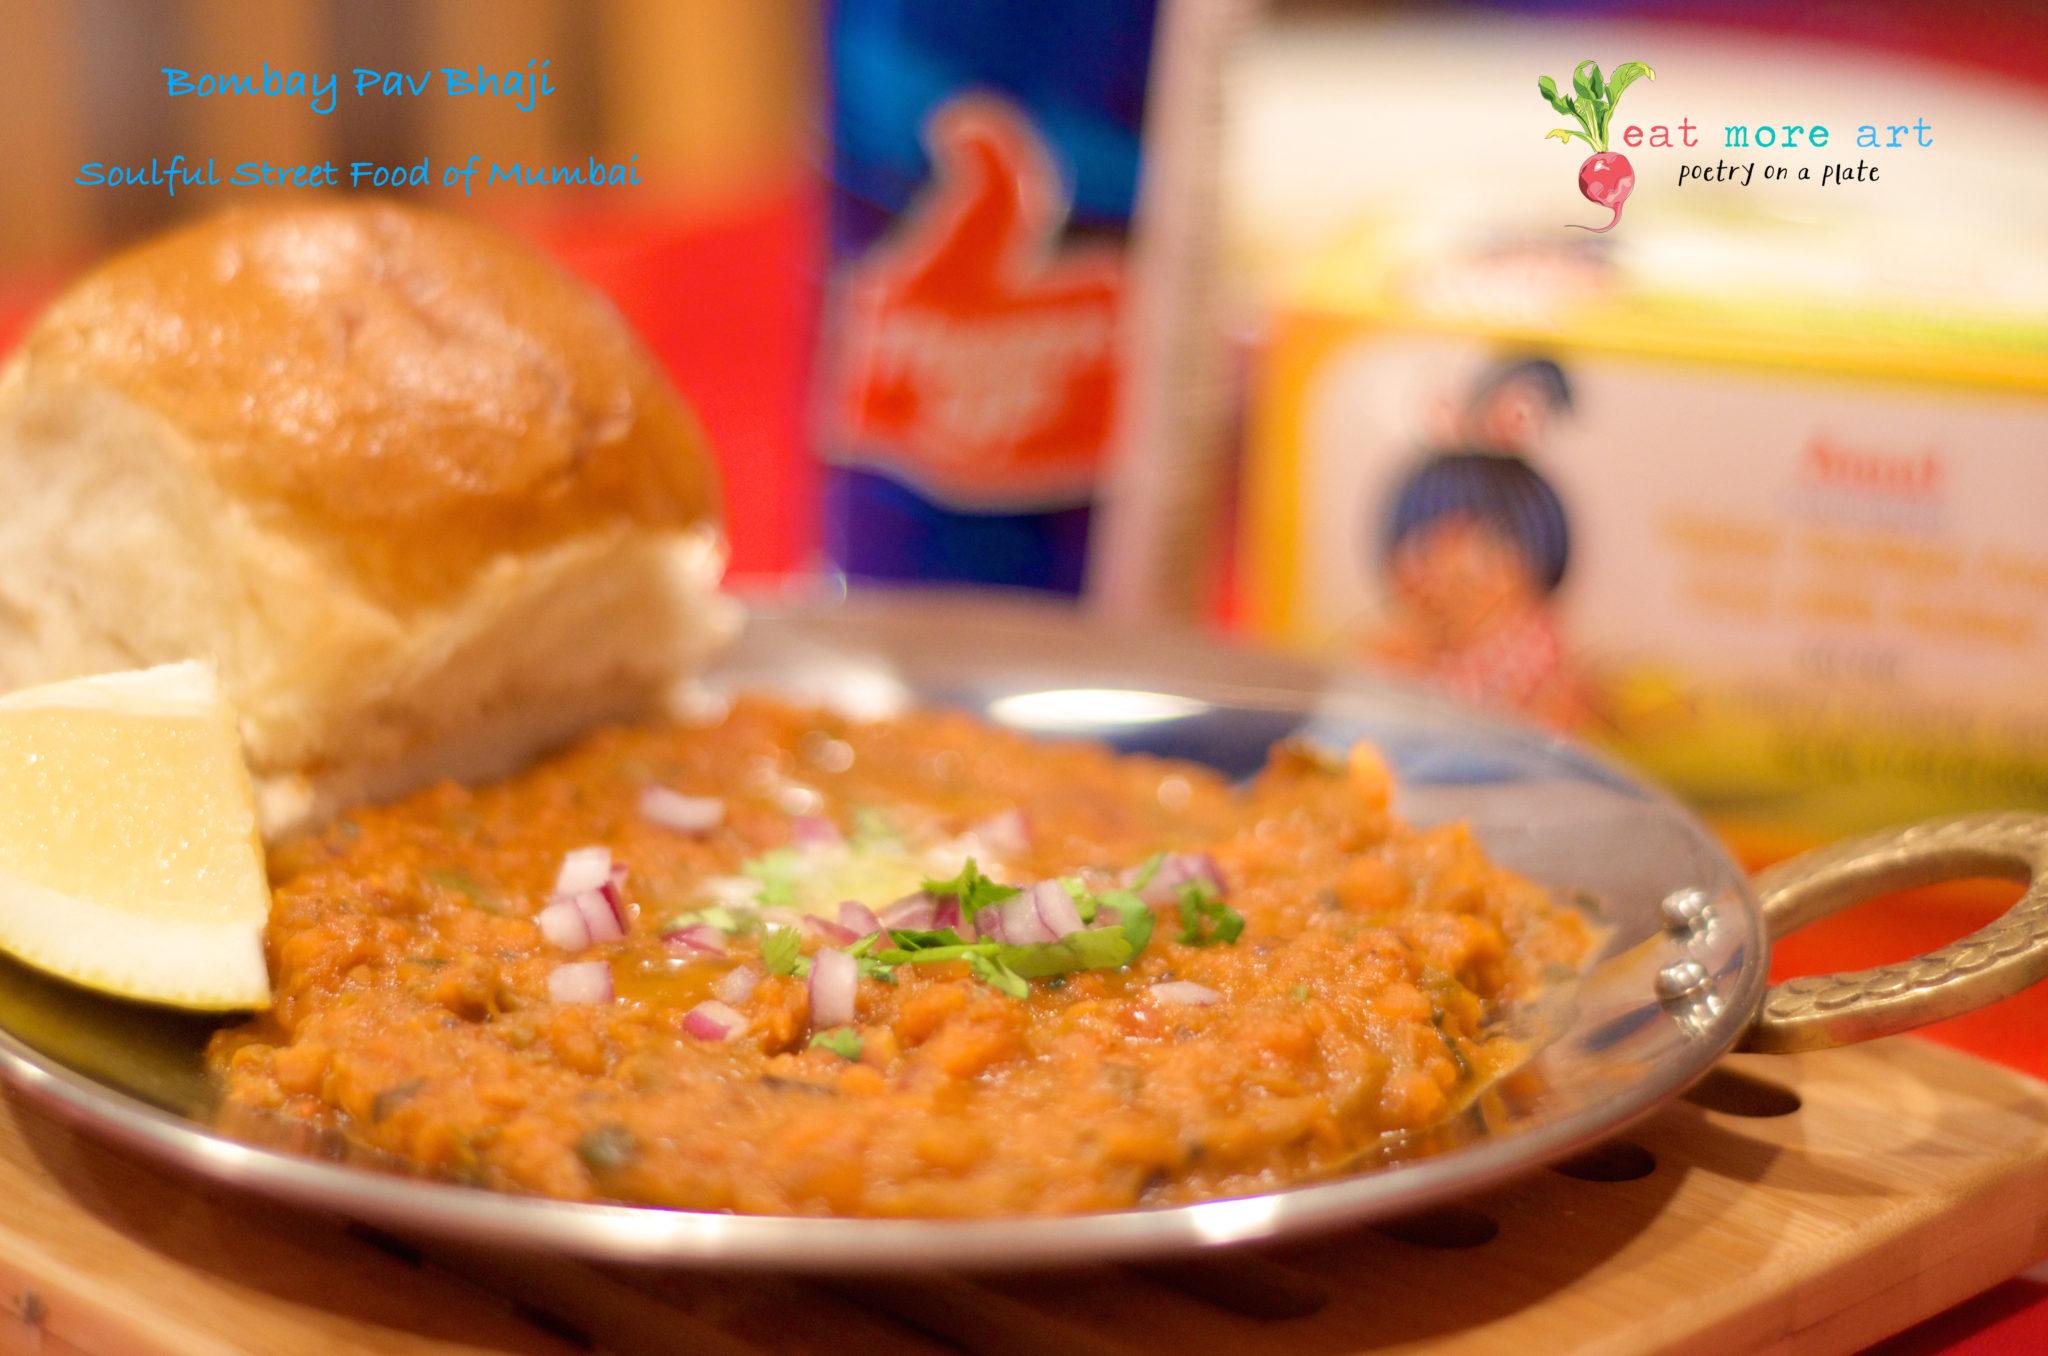 Bombay Pav Bhaji | Soulful Streetfood of Mumbai